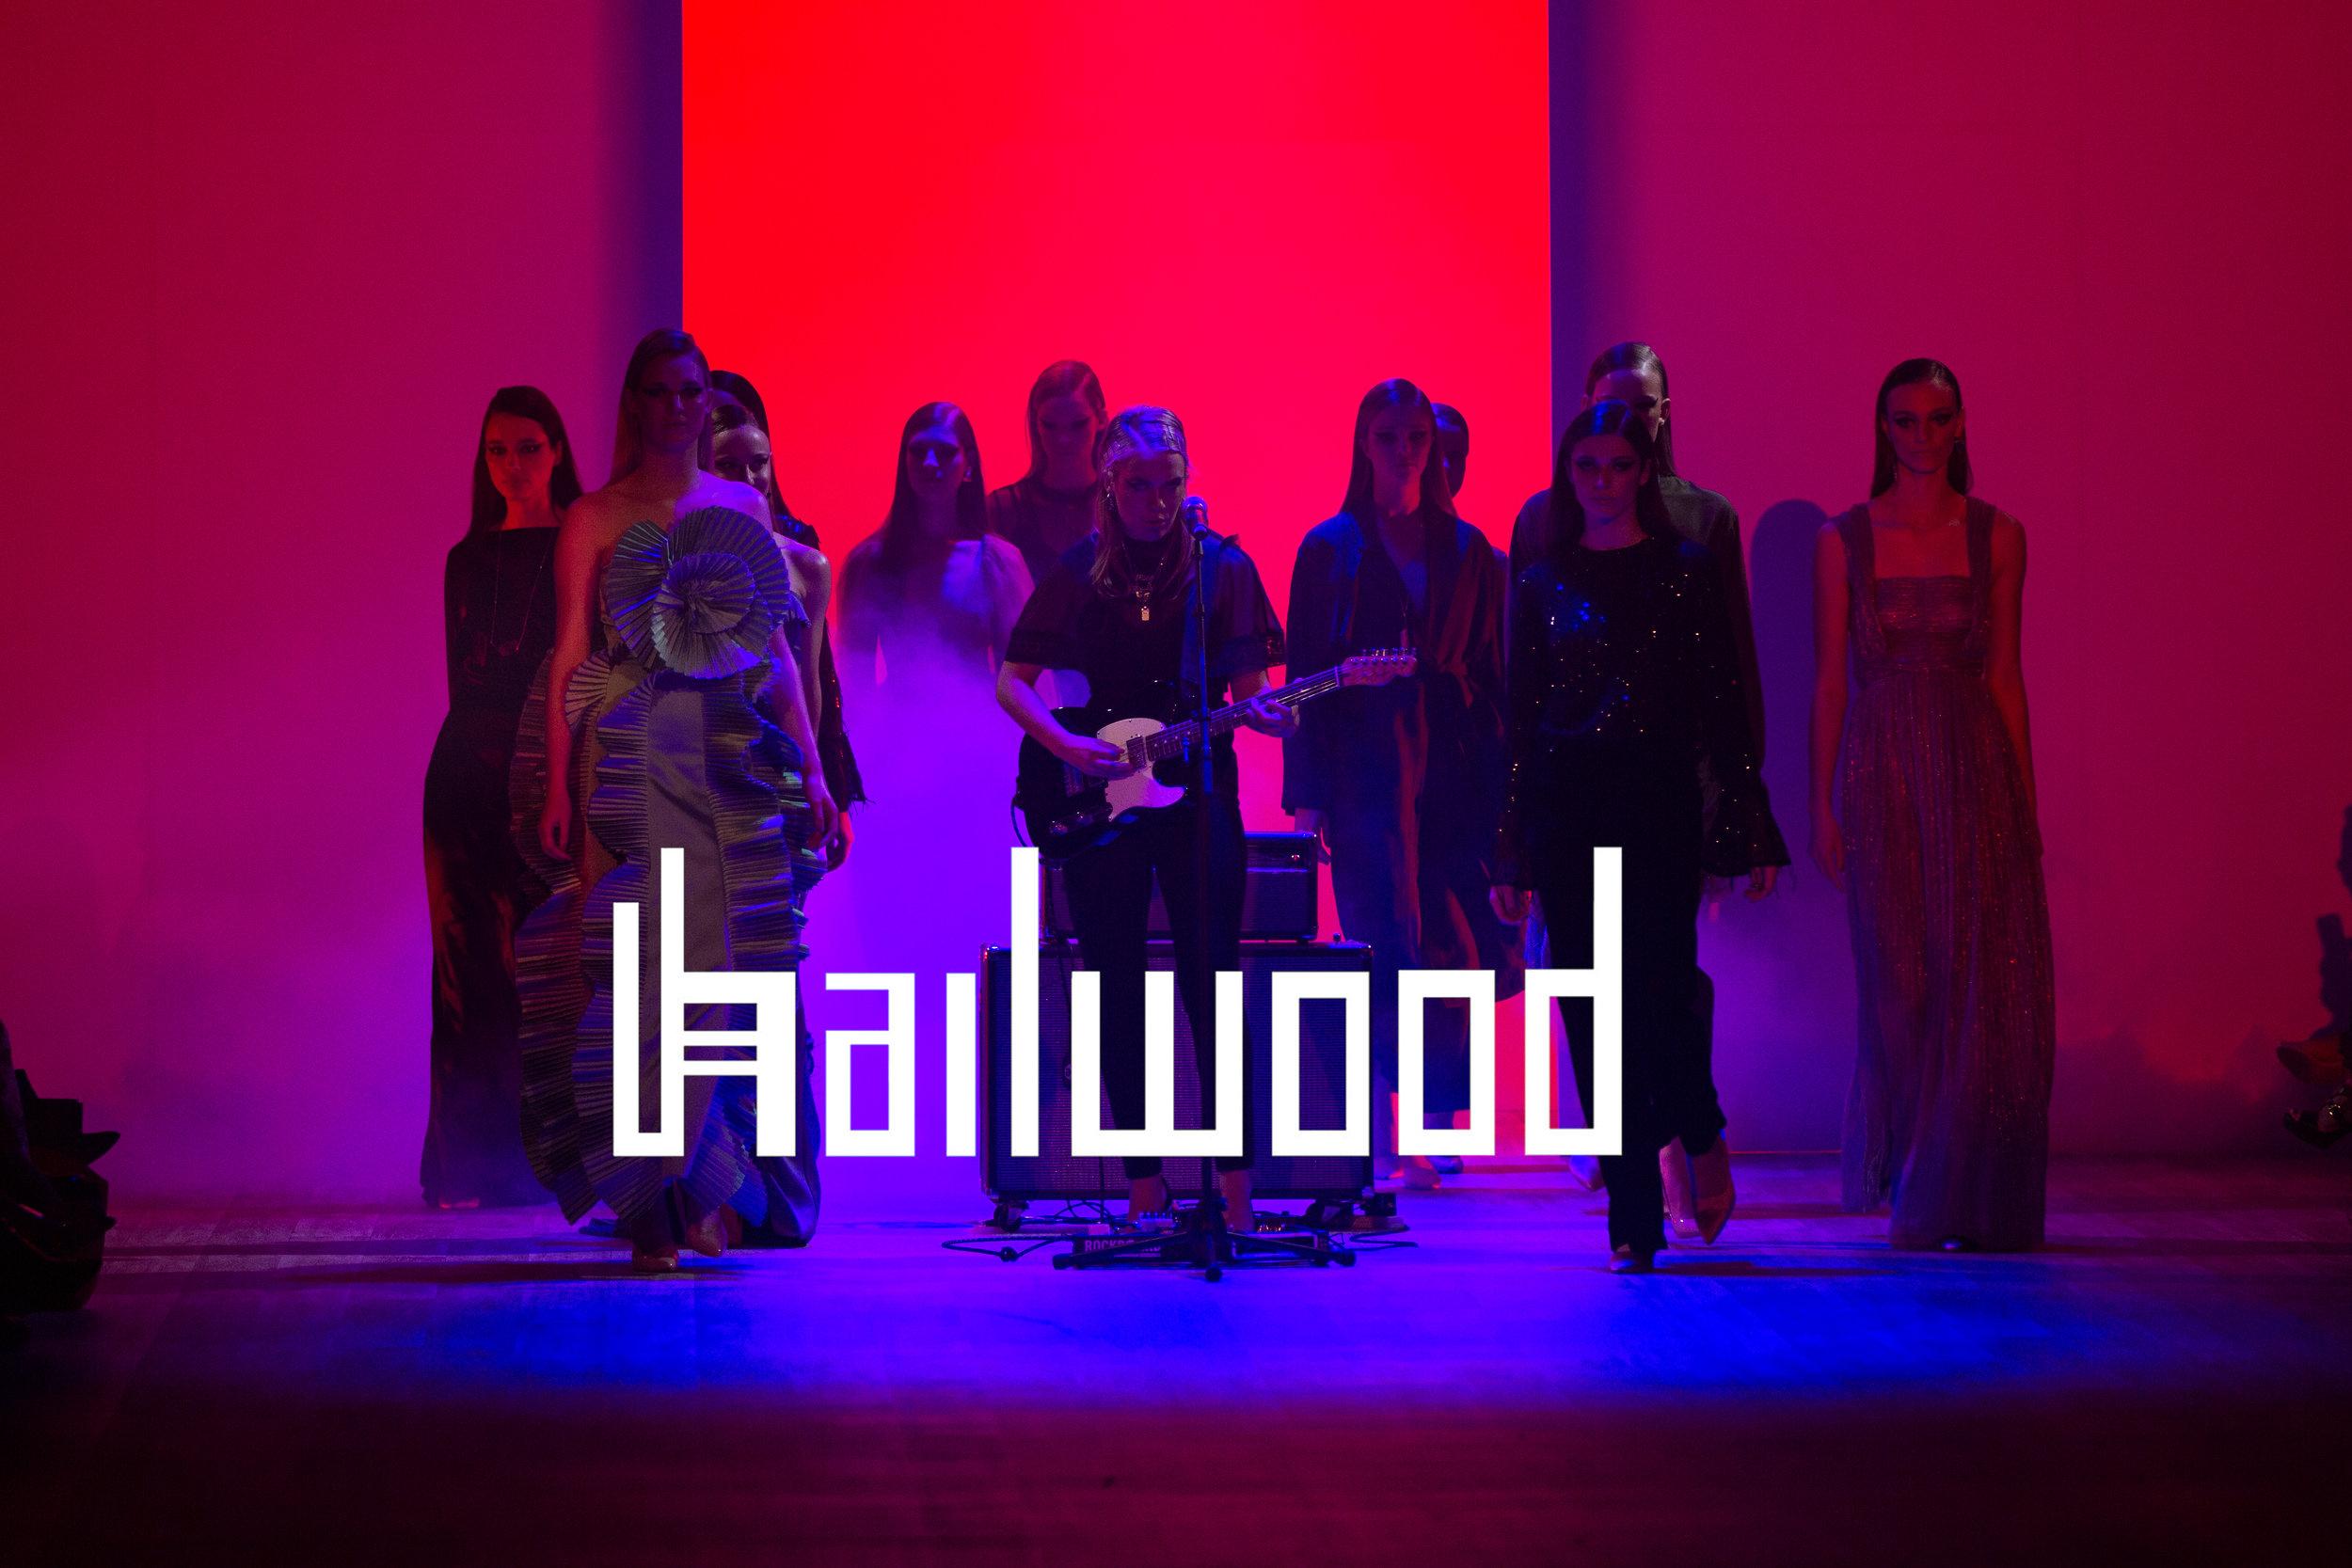 NZFW20-Hailwood-title.jpg